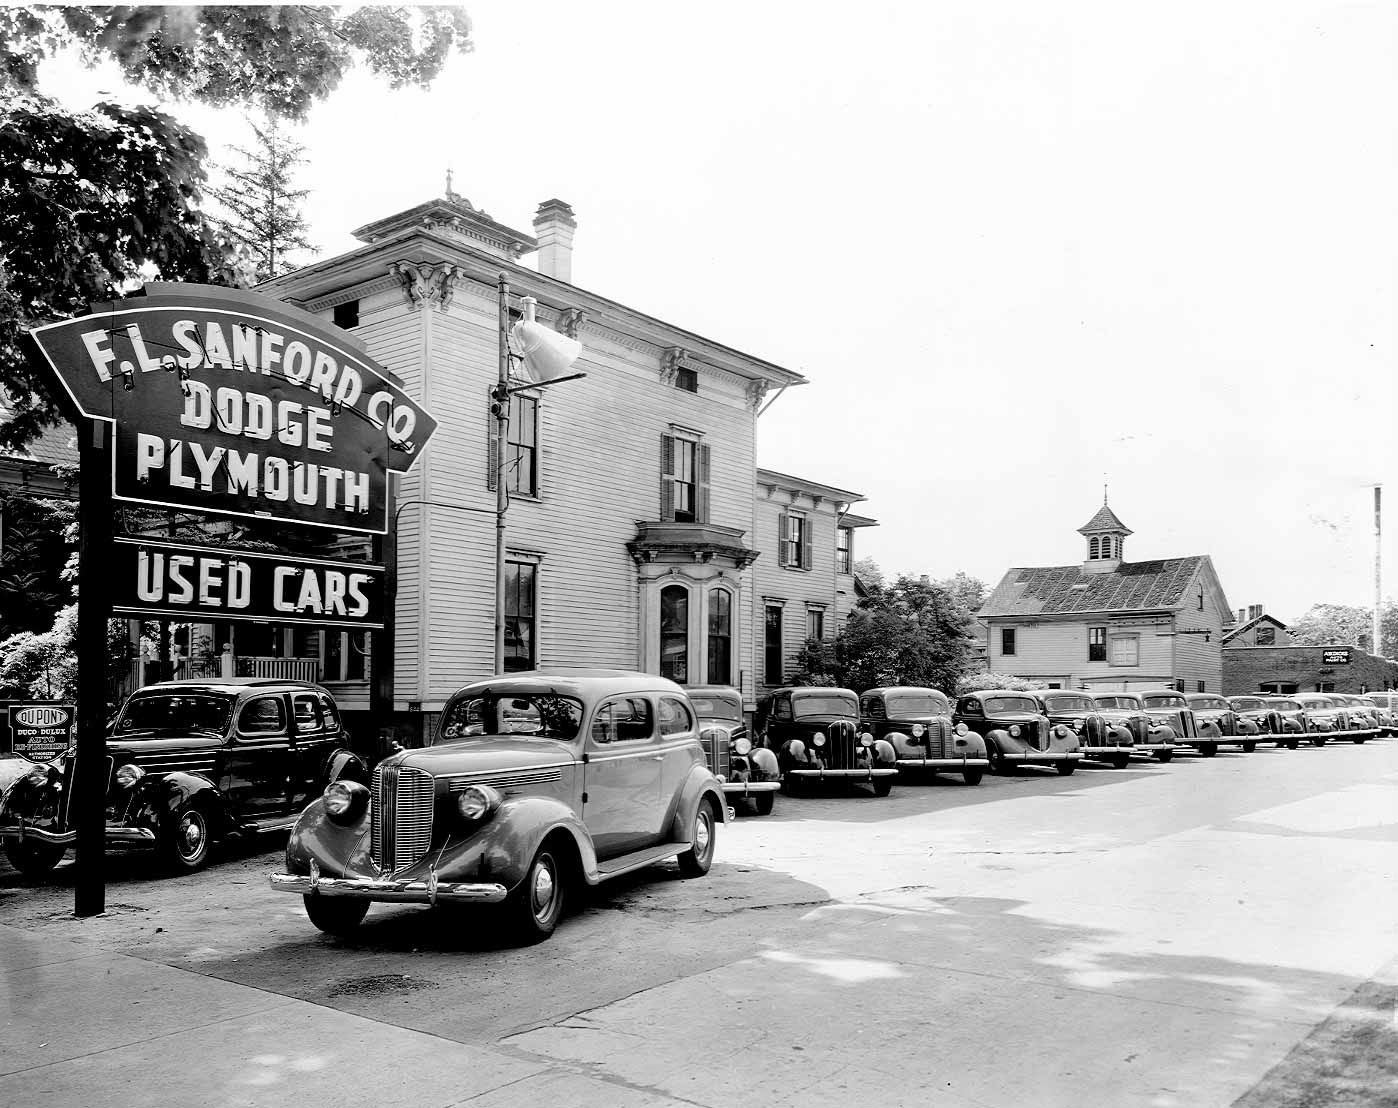 Springfield MA - Old Photos